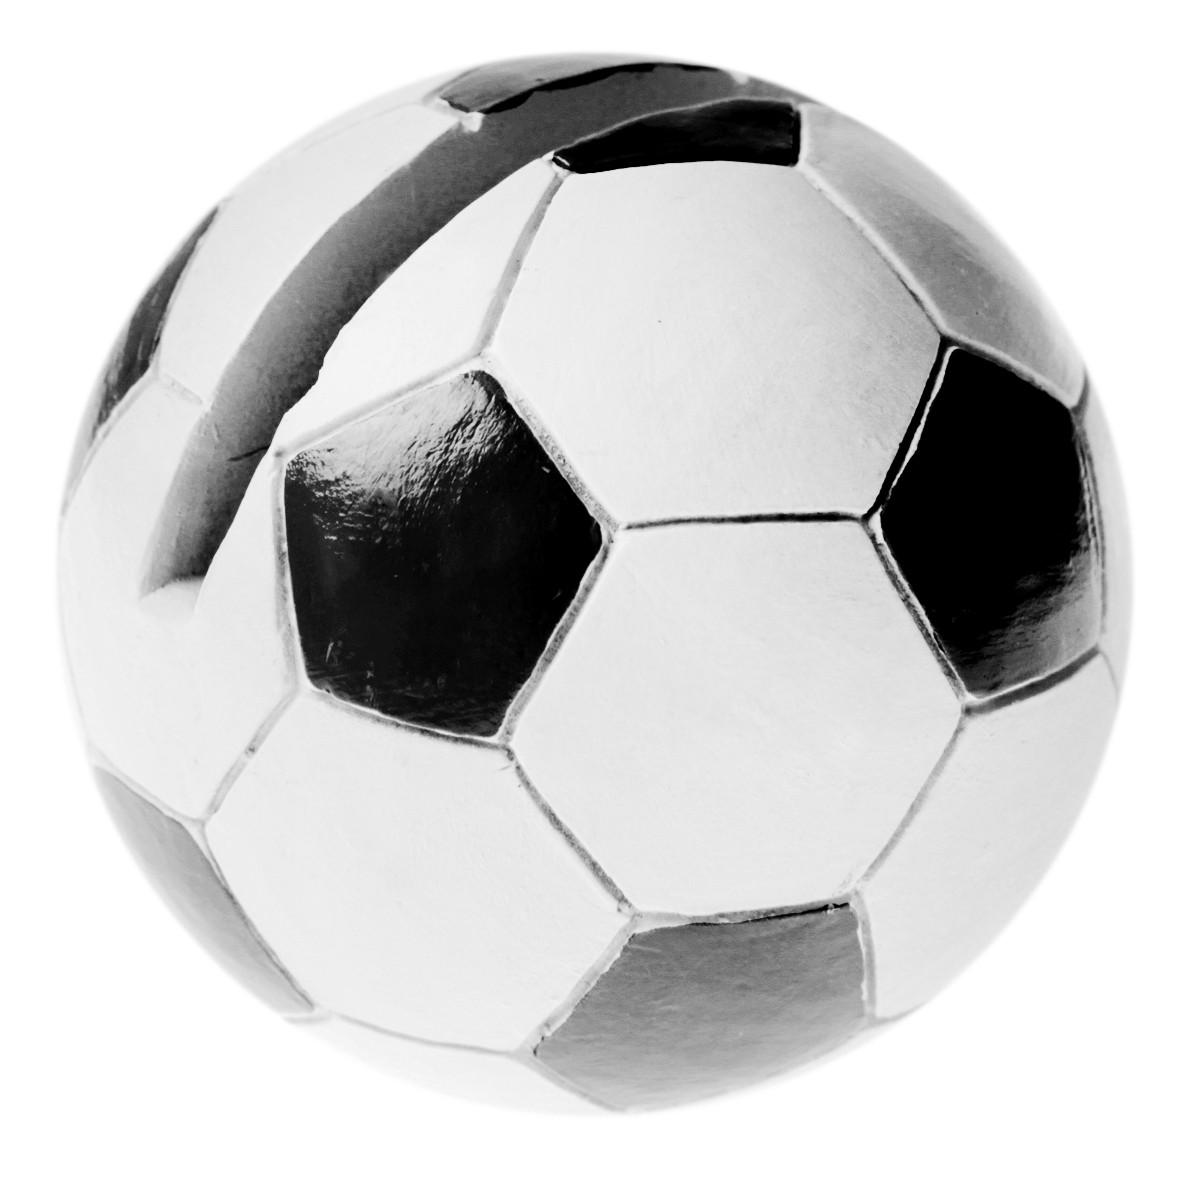 Fodbold kortholder